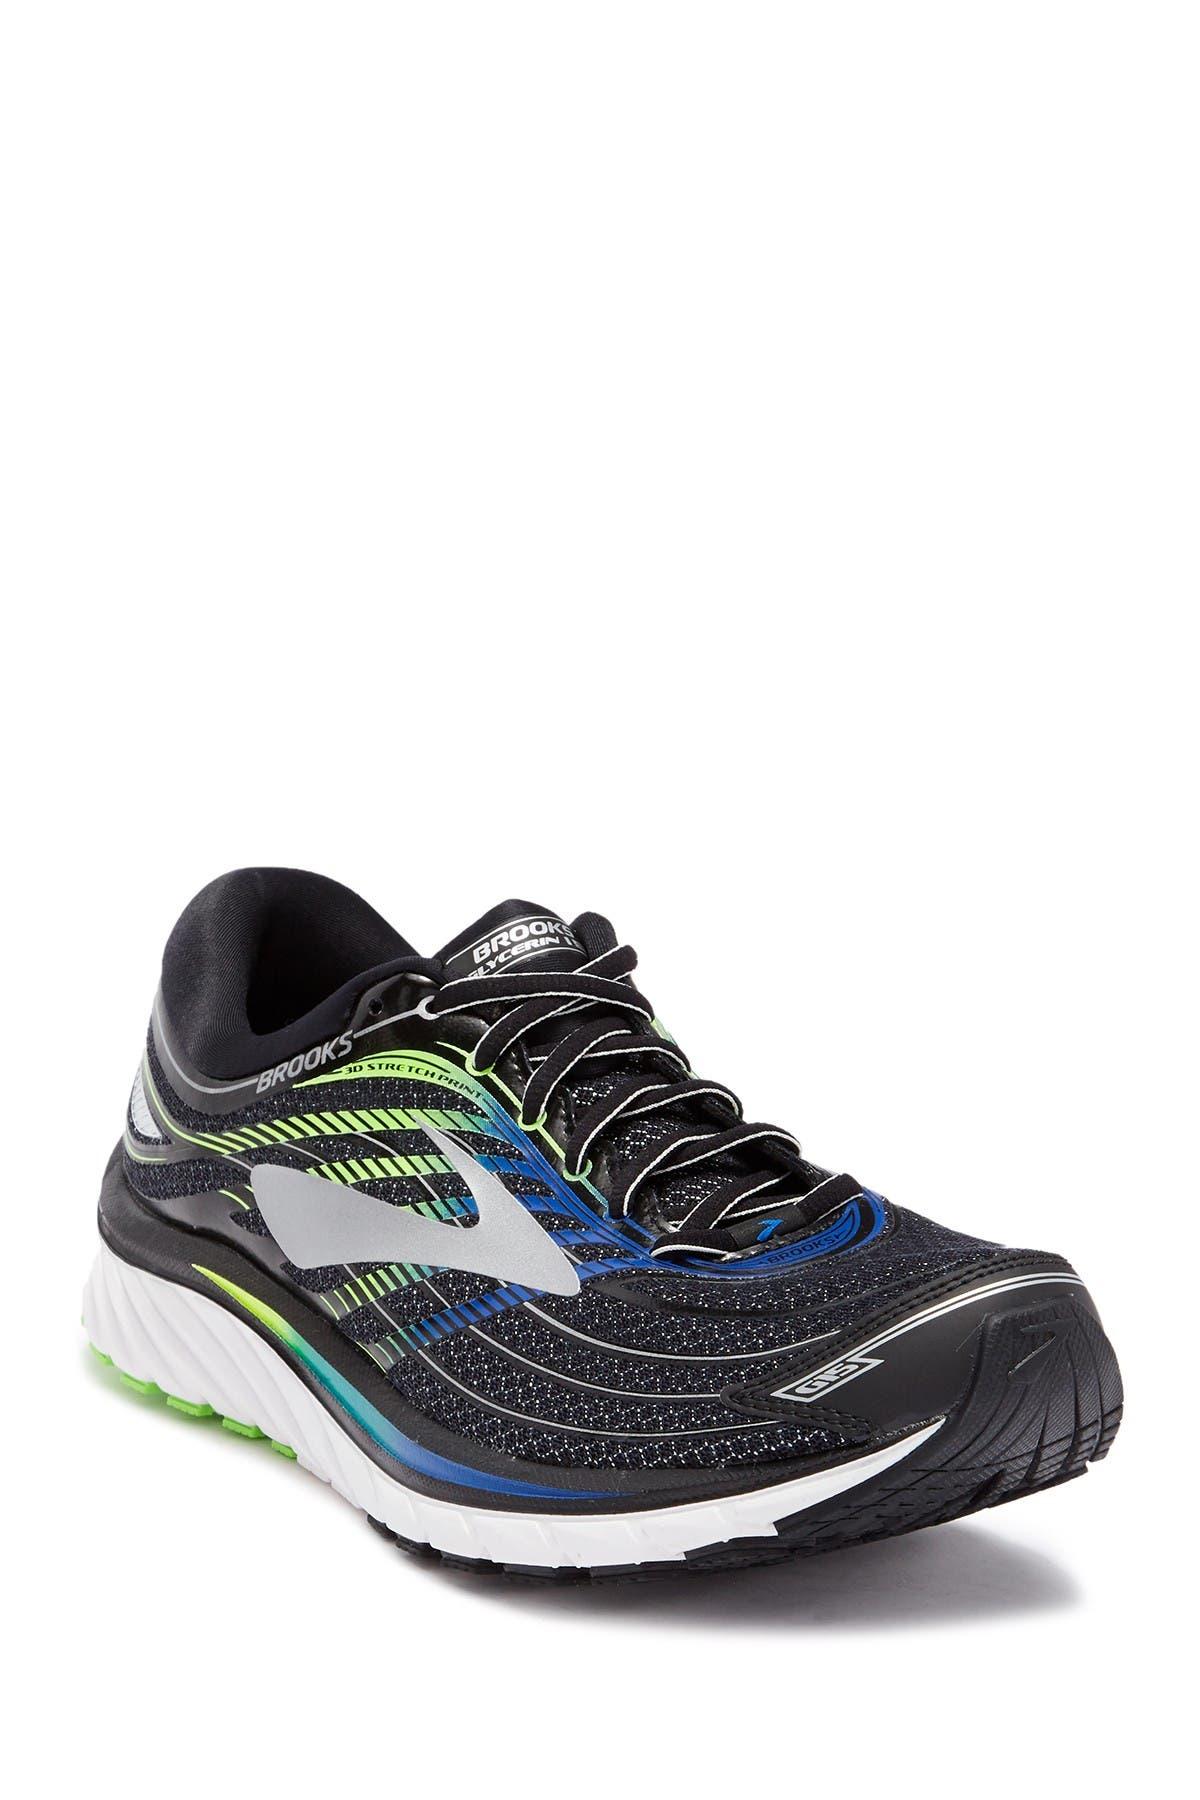 Brooks | Glycerin 15 Running Shoe